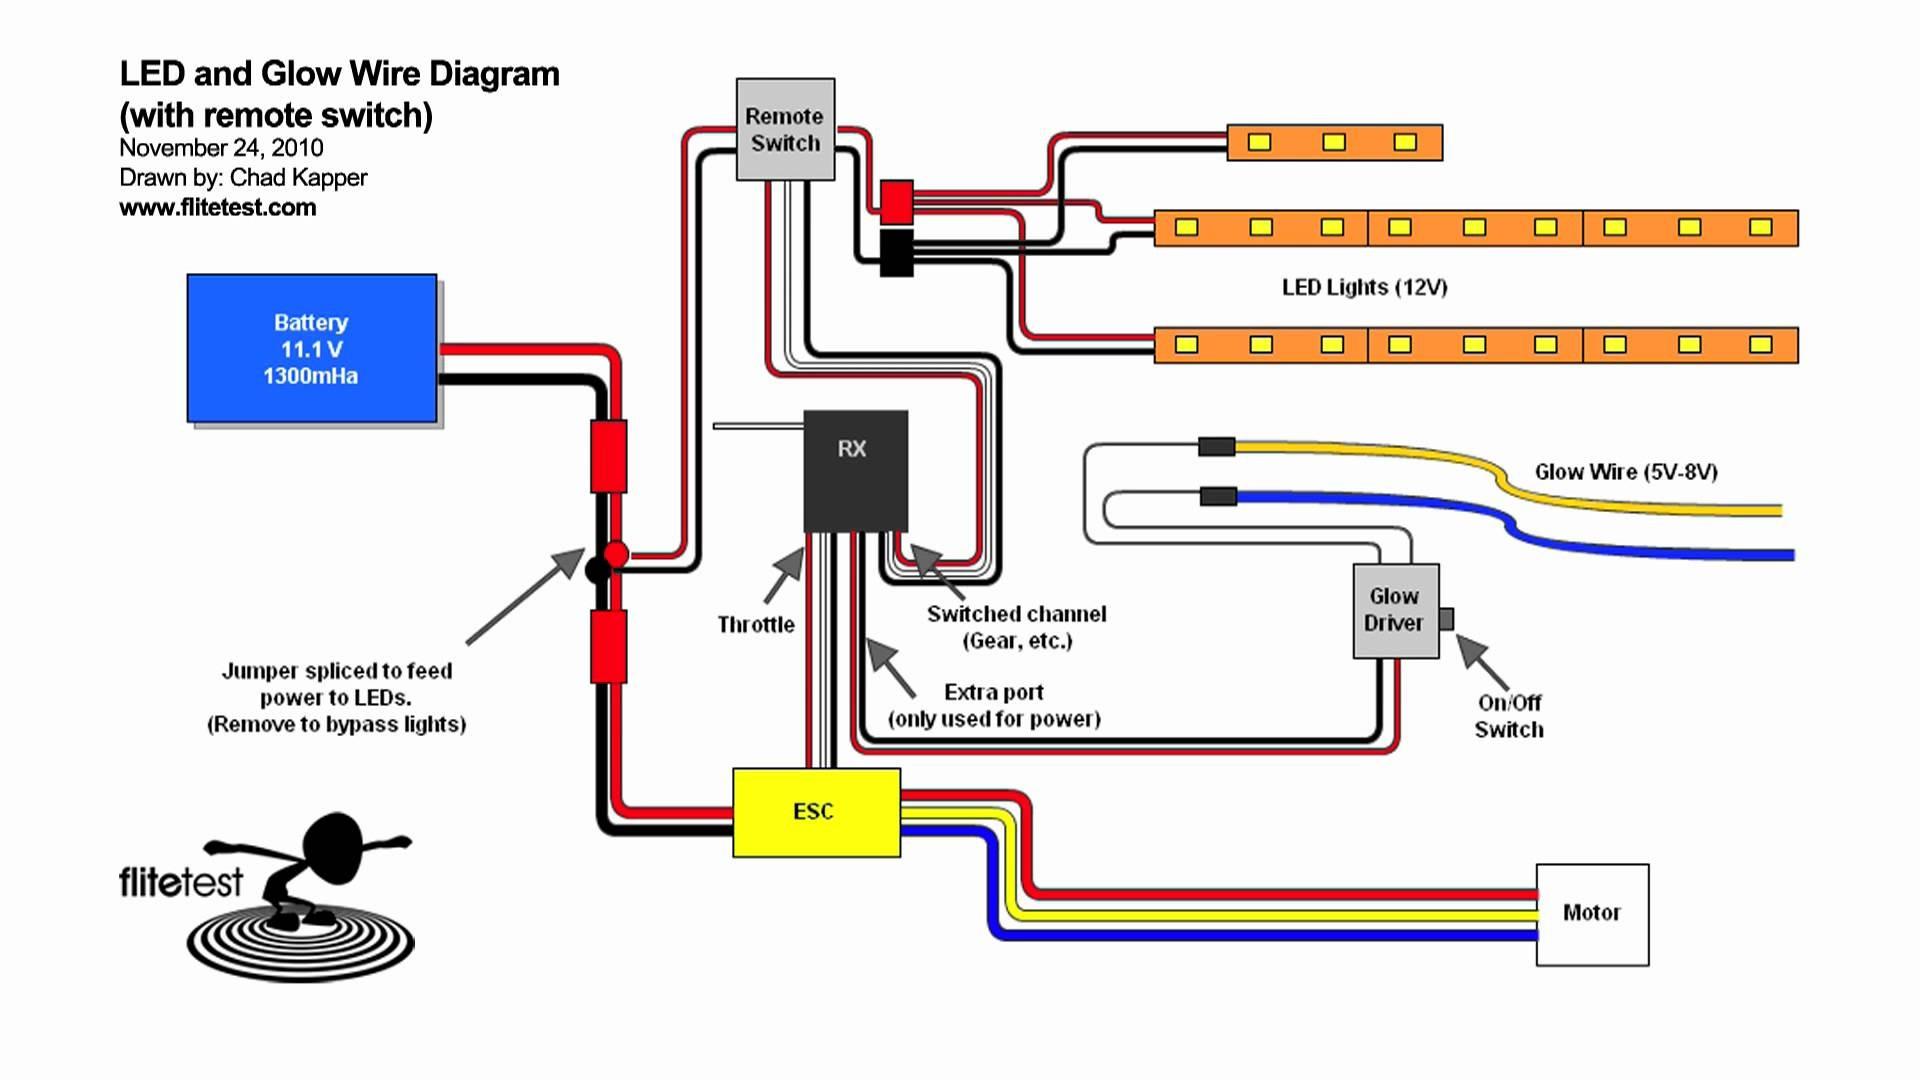 rc car wiring diagram data wiring diagrams u2022 rh naopak co RC LED Light Wiring Diagram DIY RC Car